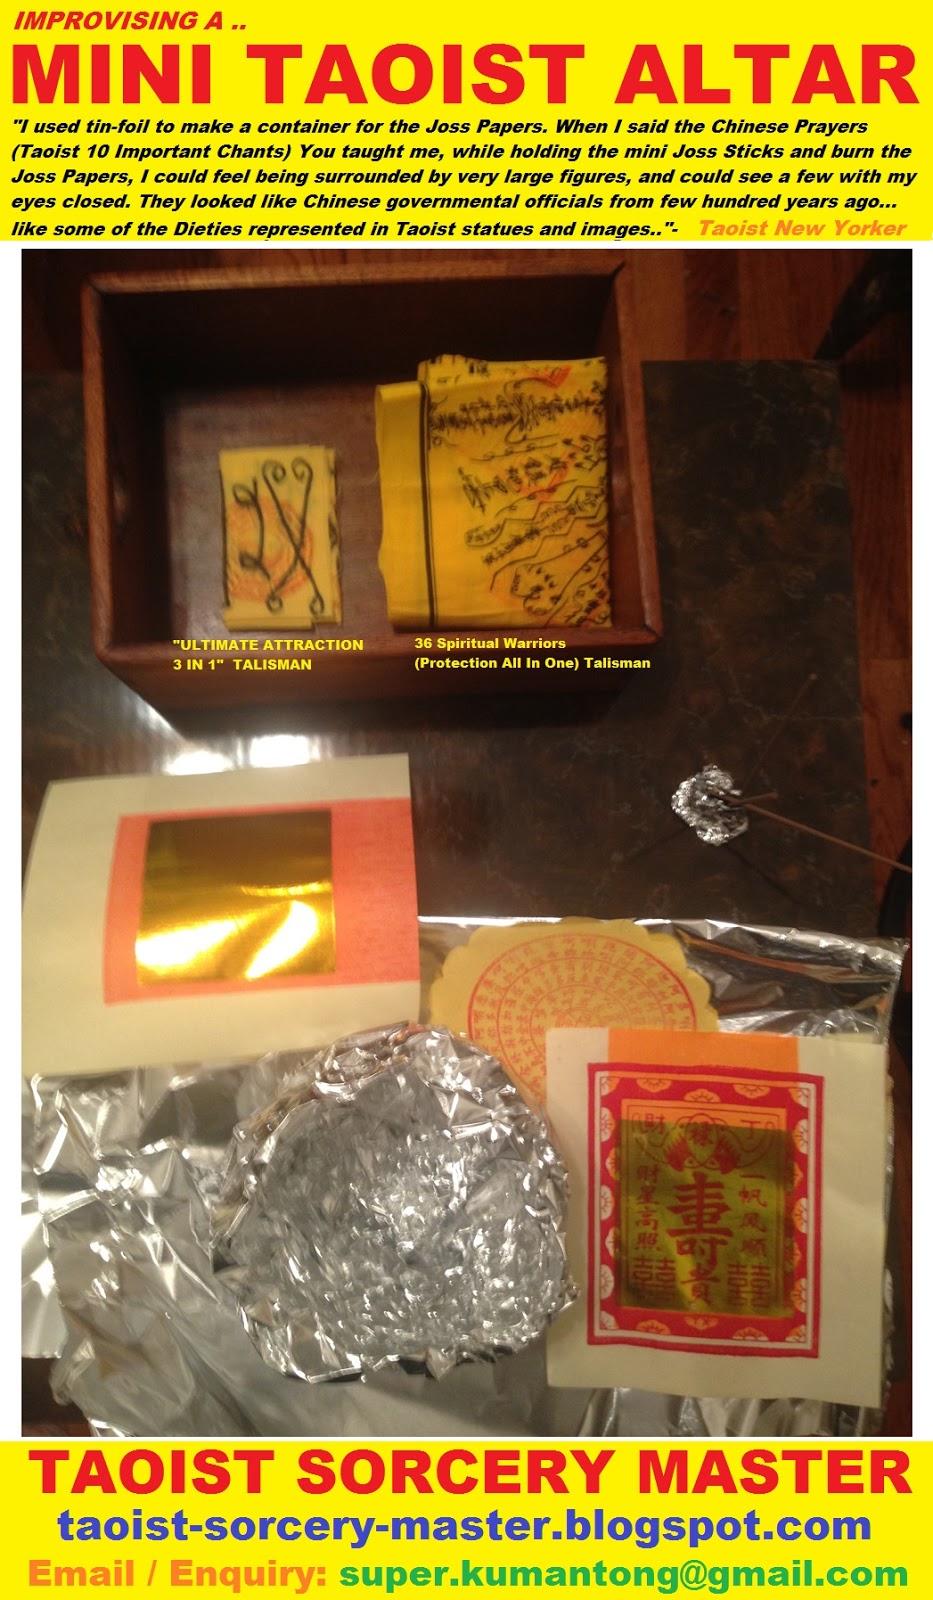 TAOIST SORCERY MASTER: Improvising A Mini Taoist Altar & Burning Of